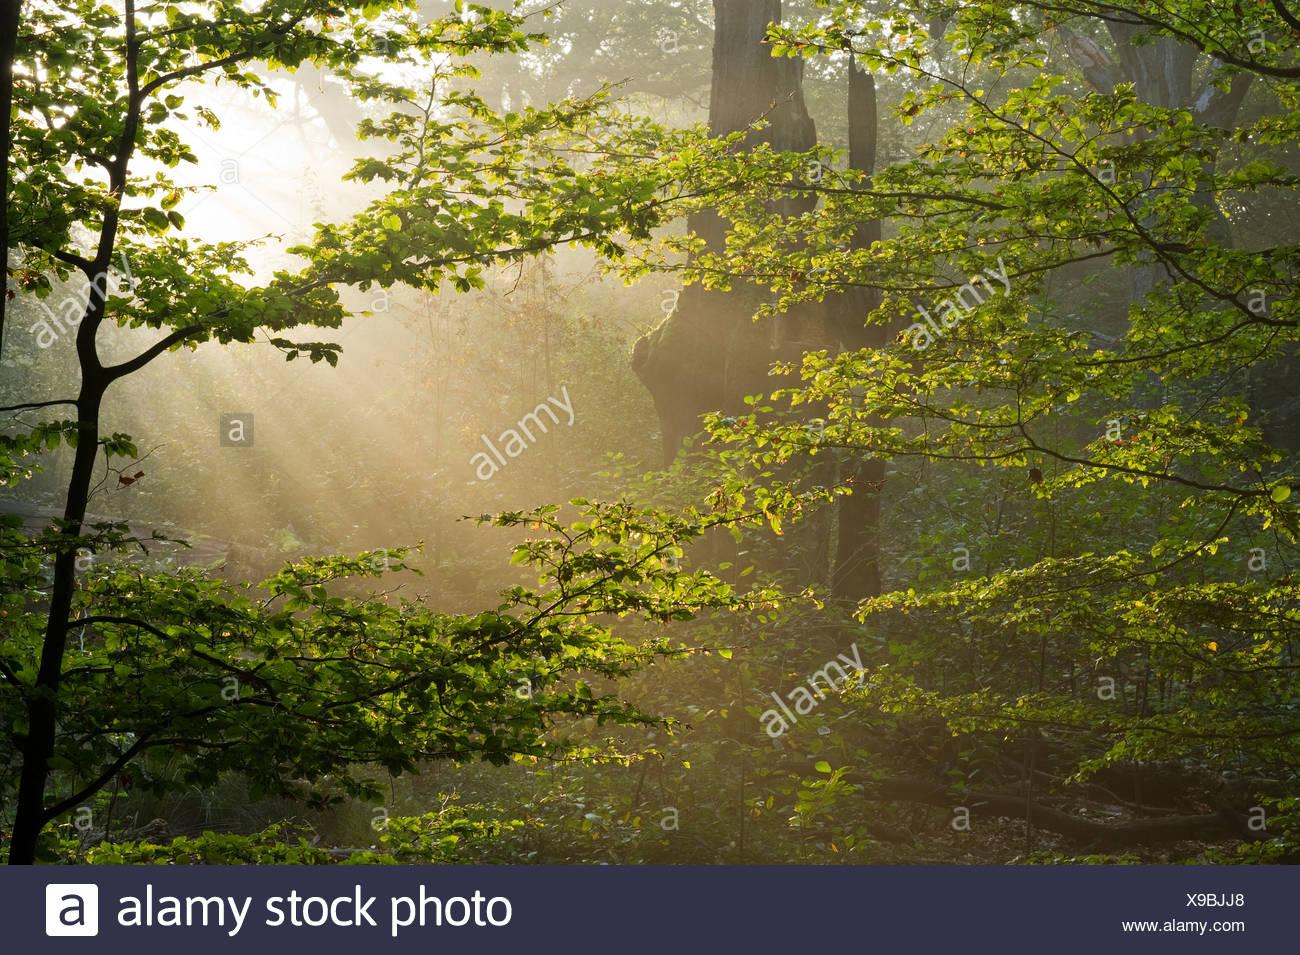 Morning mist at the Urwald Sababurg primeval forest, Hofgeismar, North Hesse, Germany, Europe - Stock Image